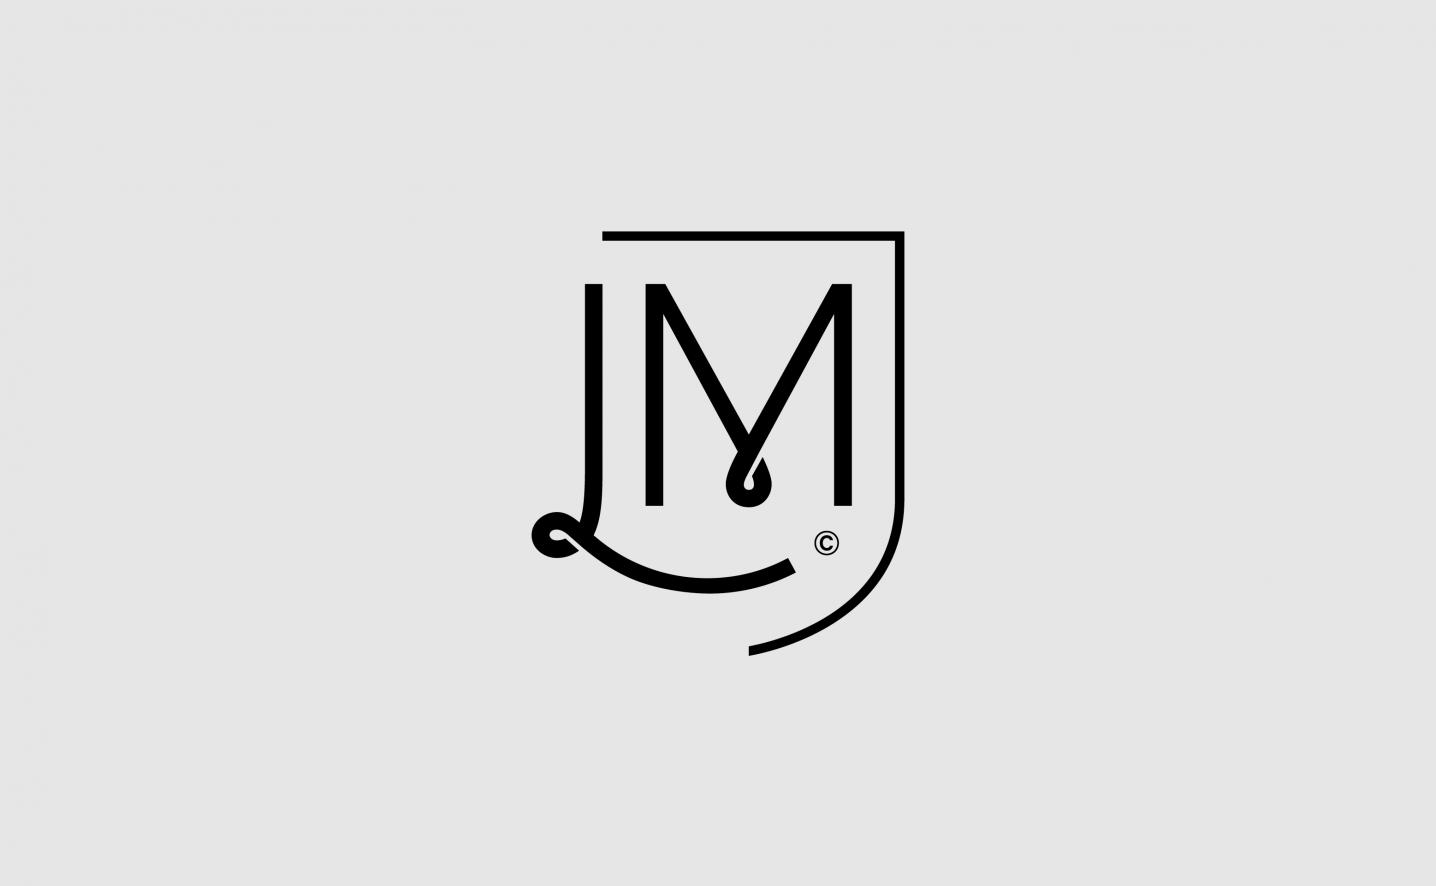 LM Stern logo design